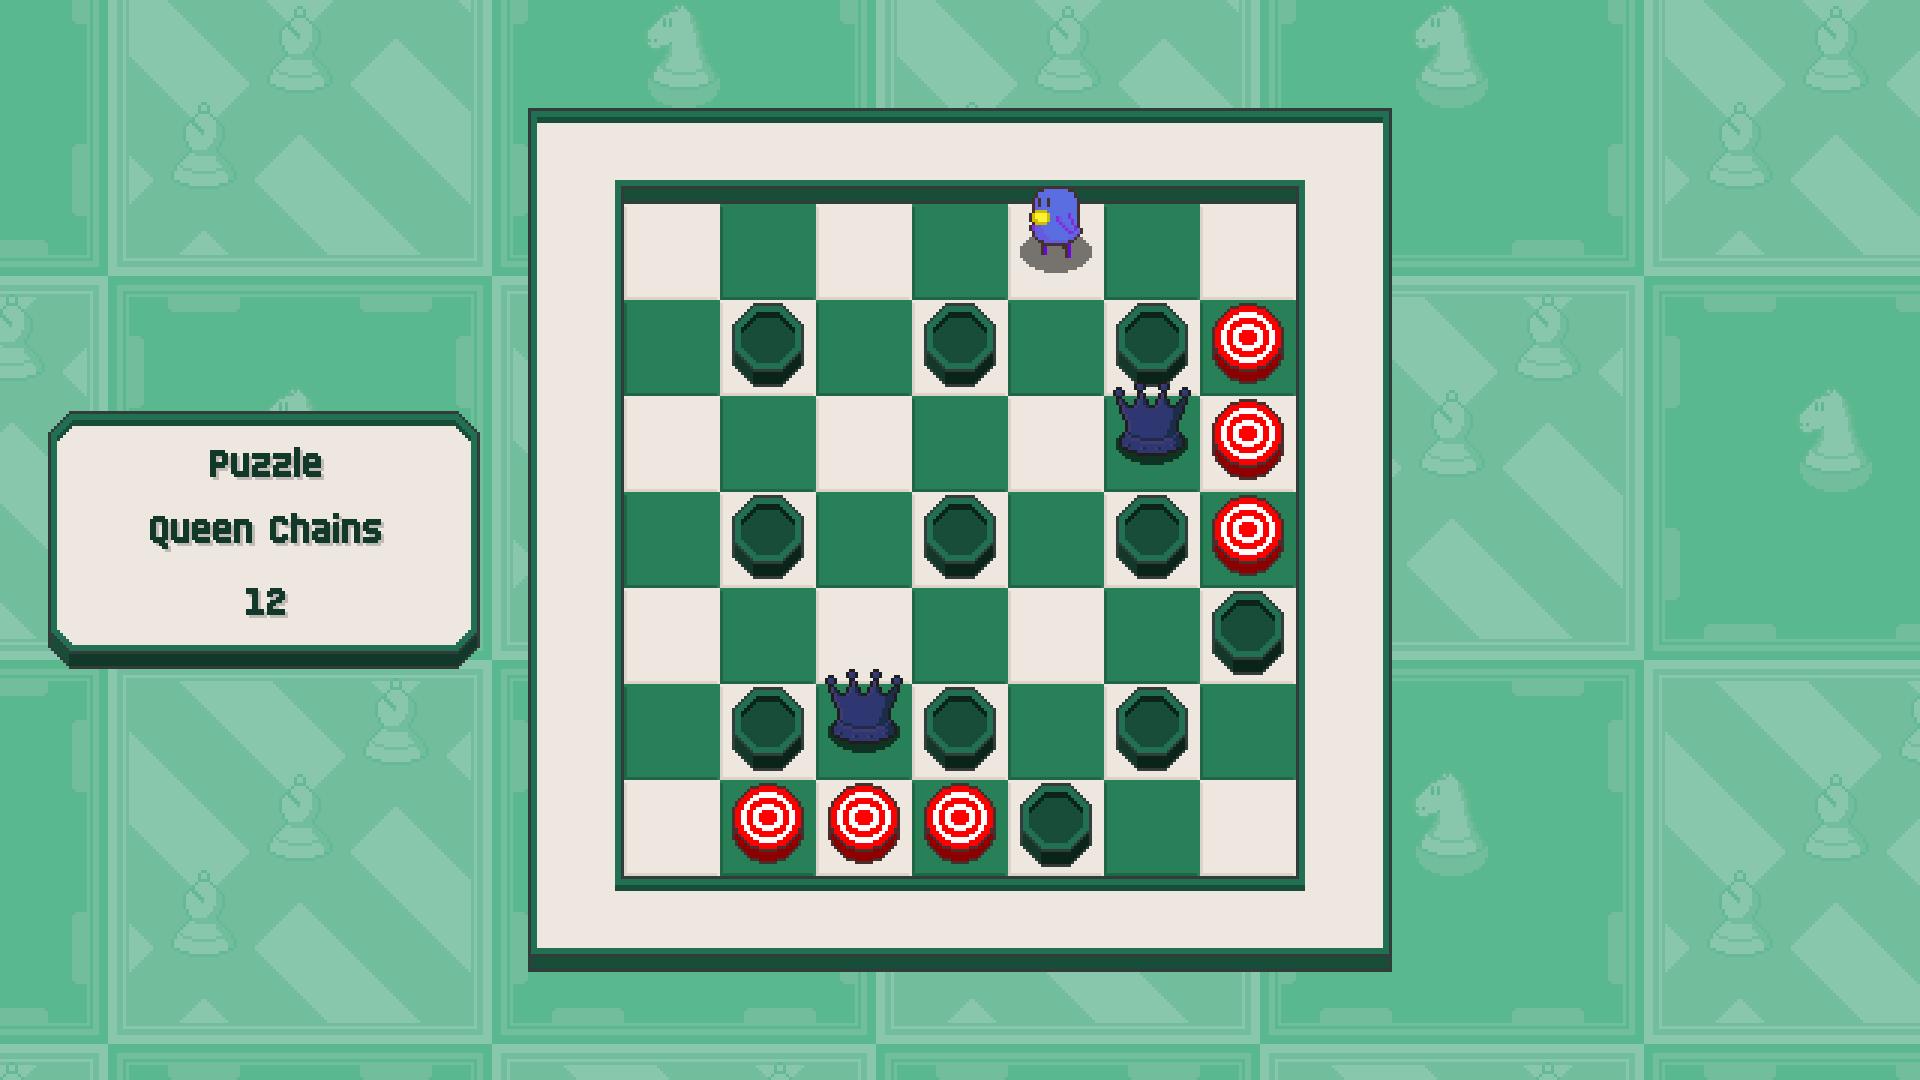 Chessplosion - Puzzle Solution Guide + Achievements Walkthrough - Beginner: Queen Chains - A488C80